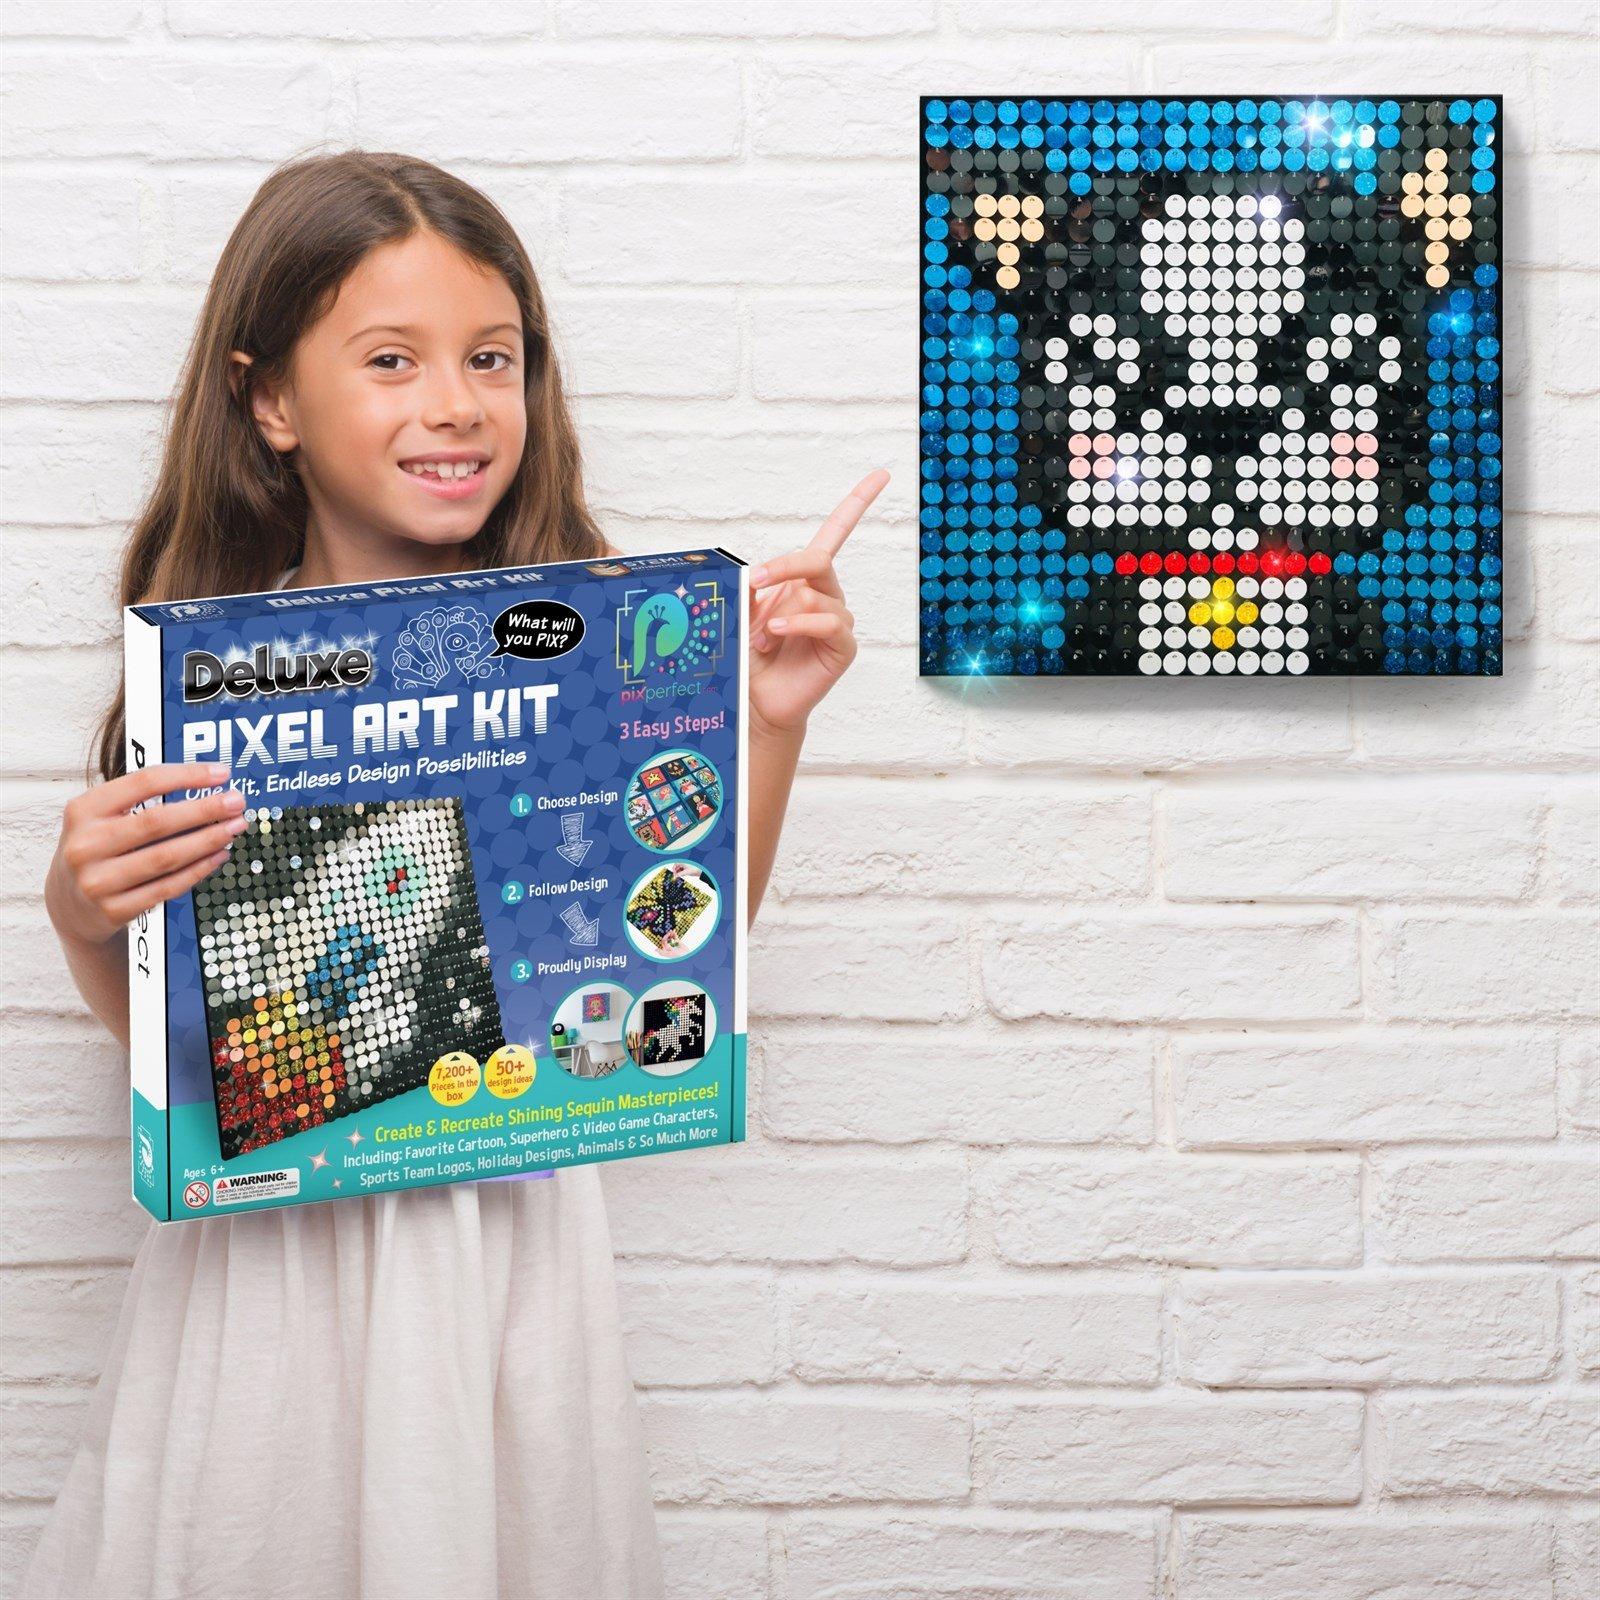 Pix Perfect™ Deluxe Pixel Art Kit Bundle